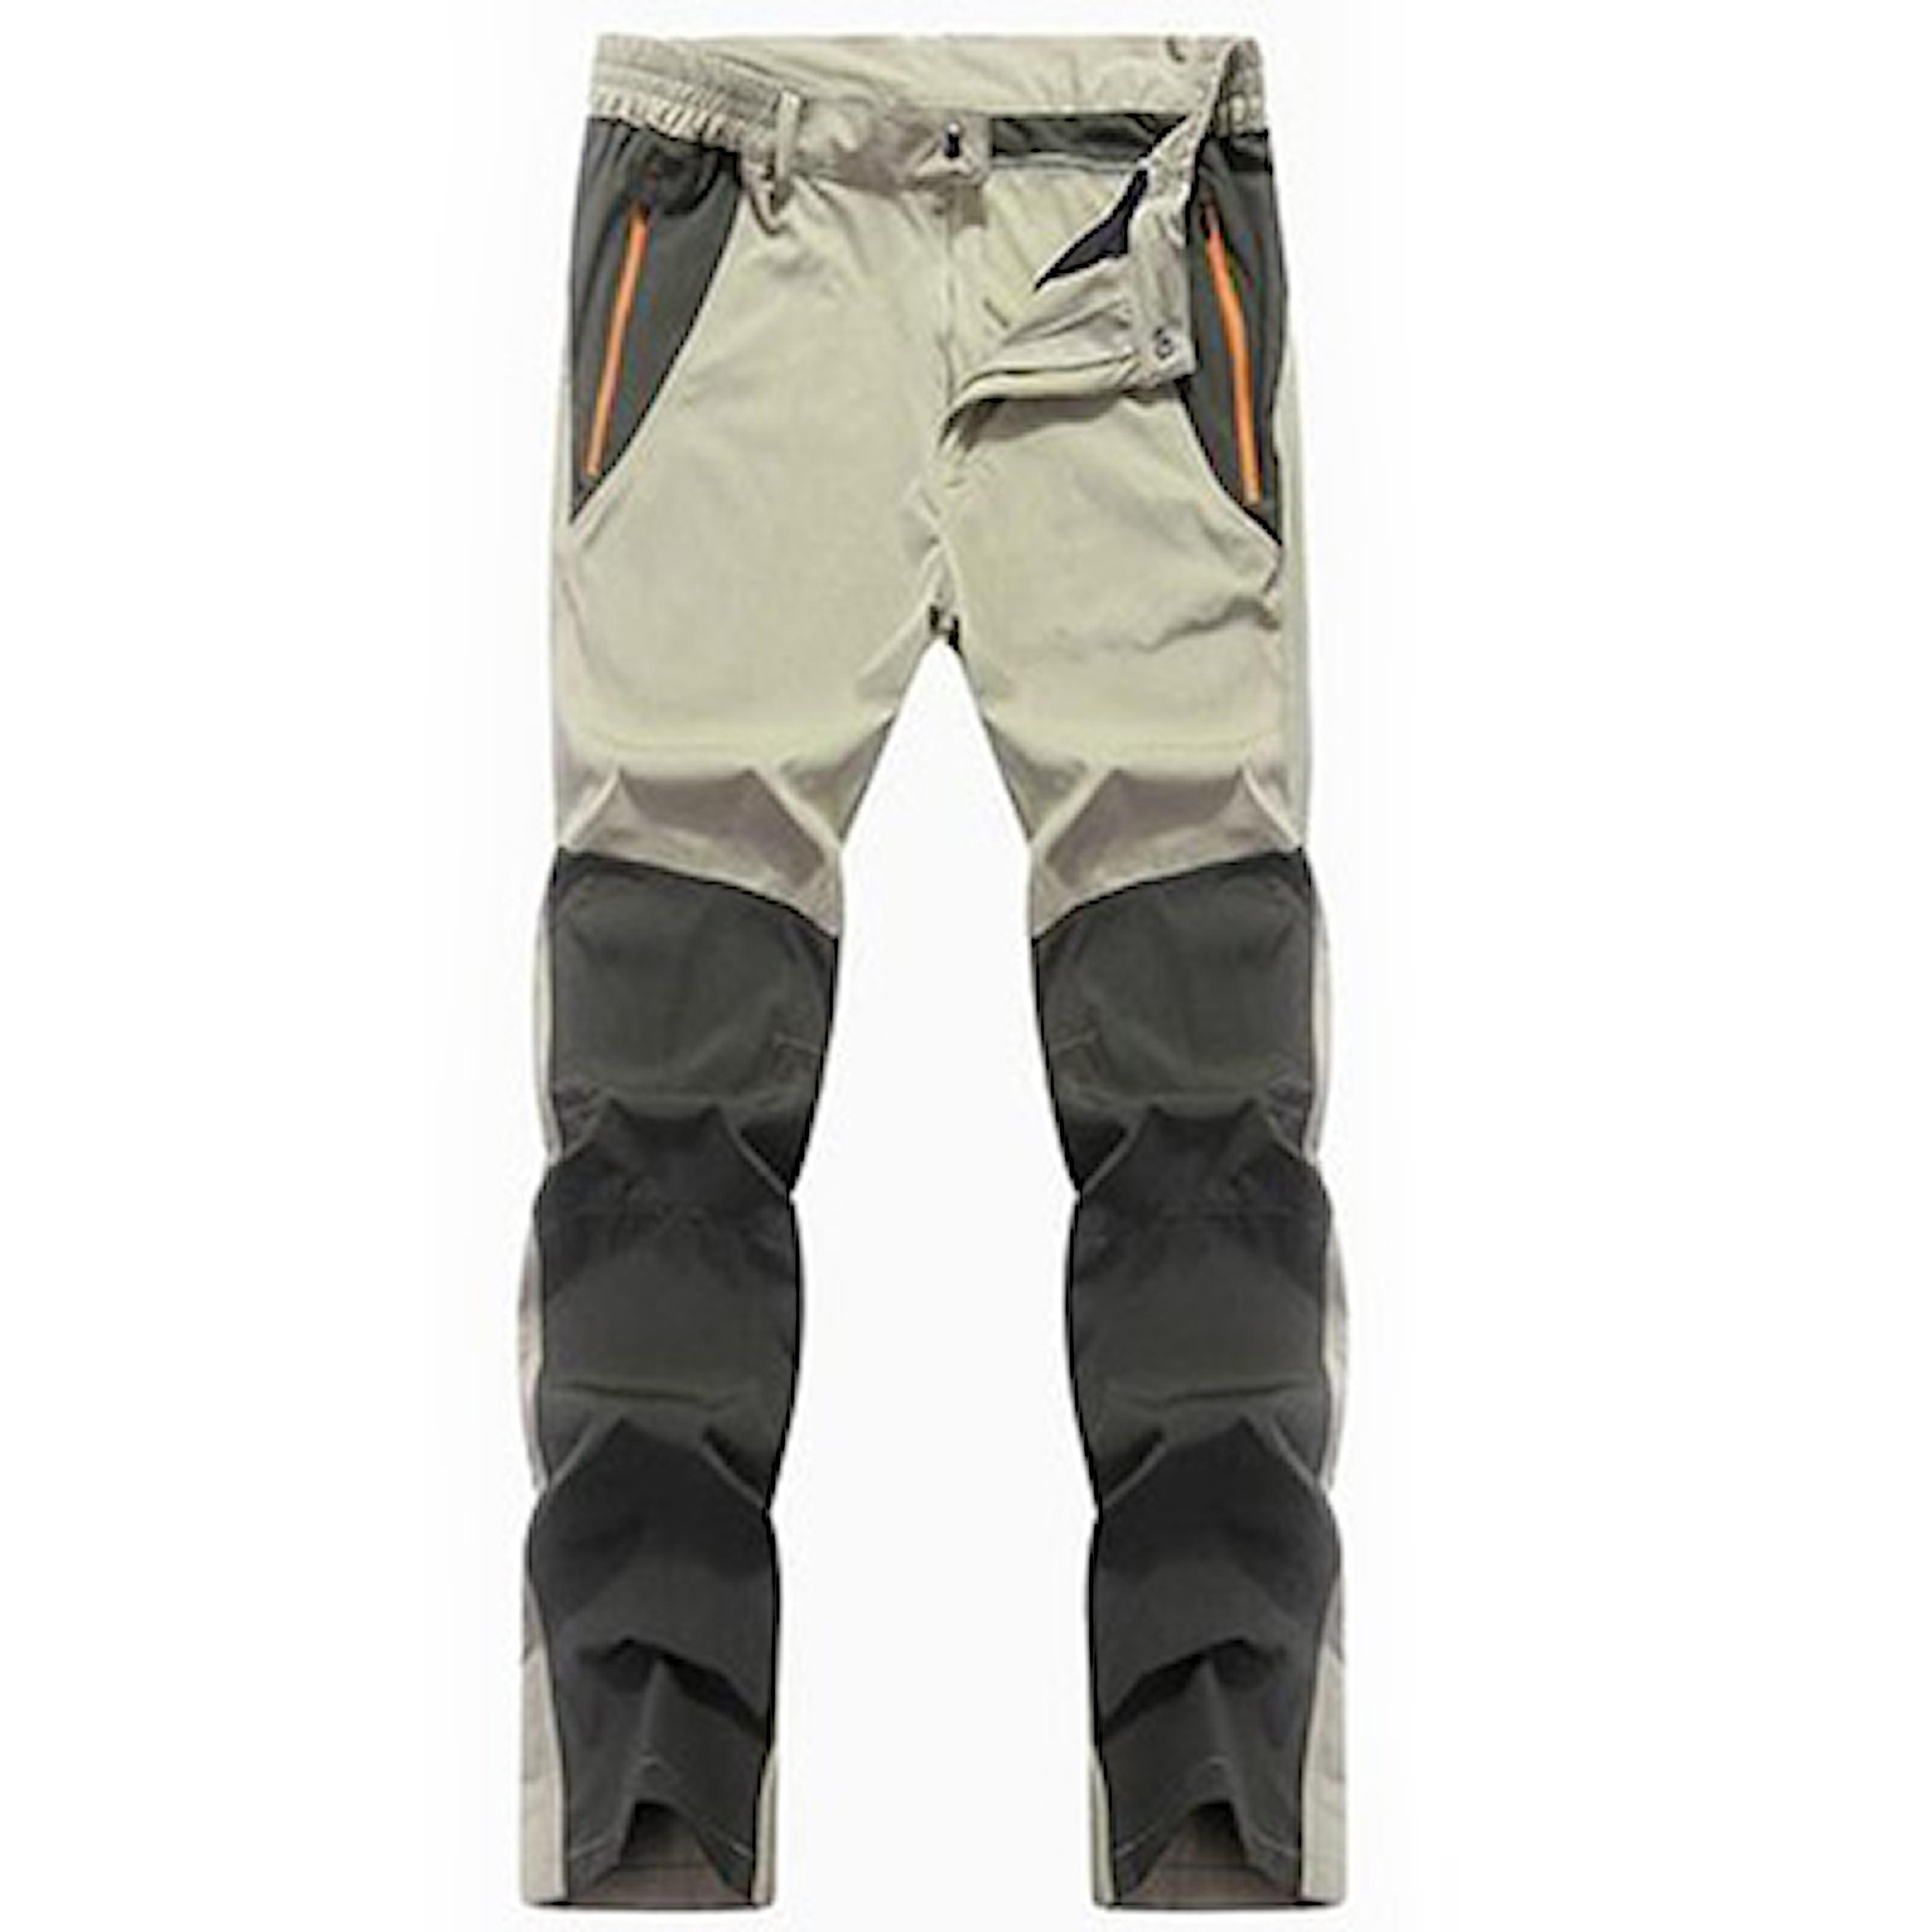 Khaki/Grön, 4XL, Men's Outdoor Hiking Pants, Friluftsbyxor i herrmodell, ,